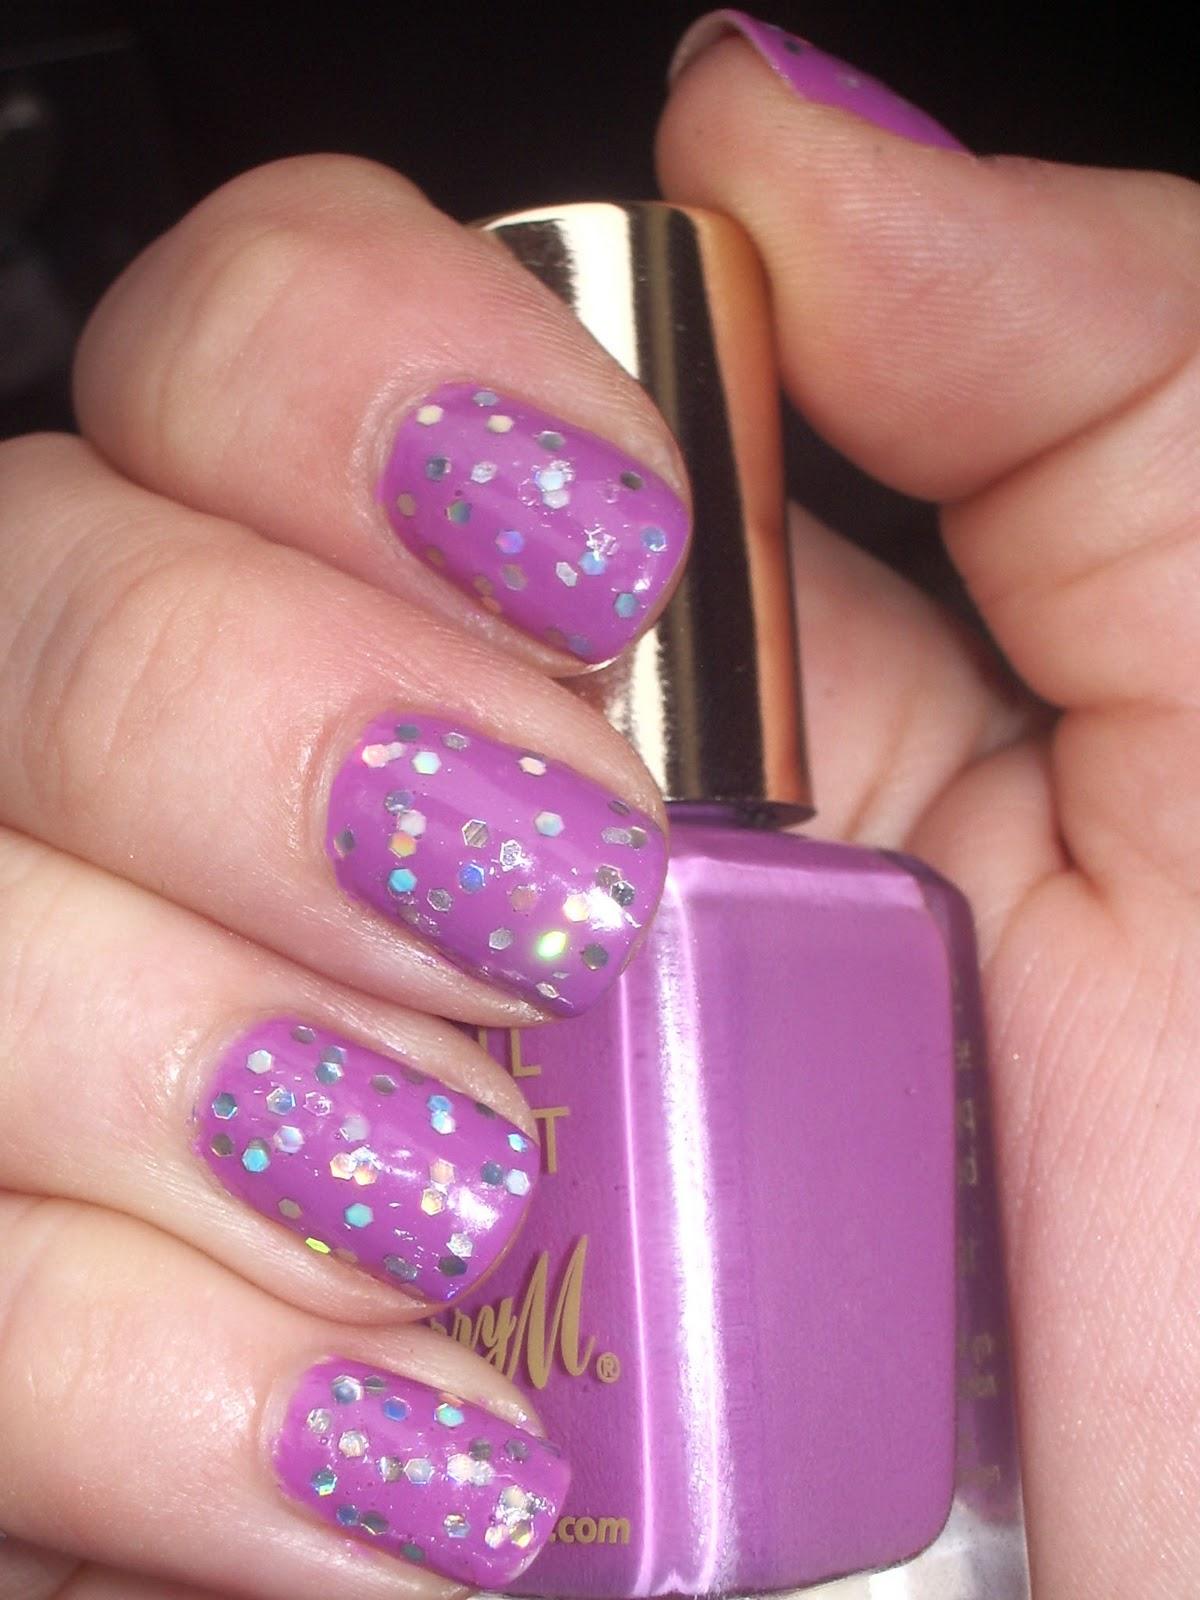 Craft nail hologram hexogram chunky chunky glitter for Chunky glitter for crafts